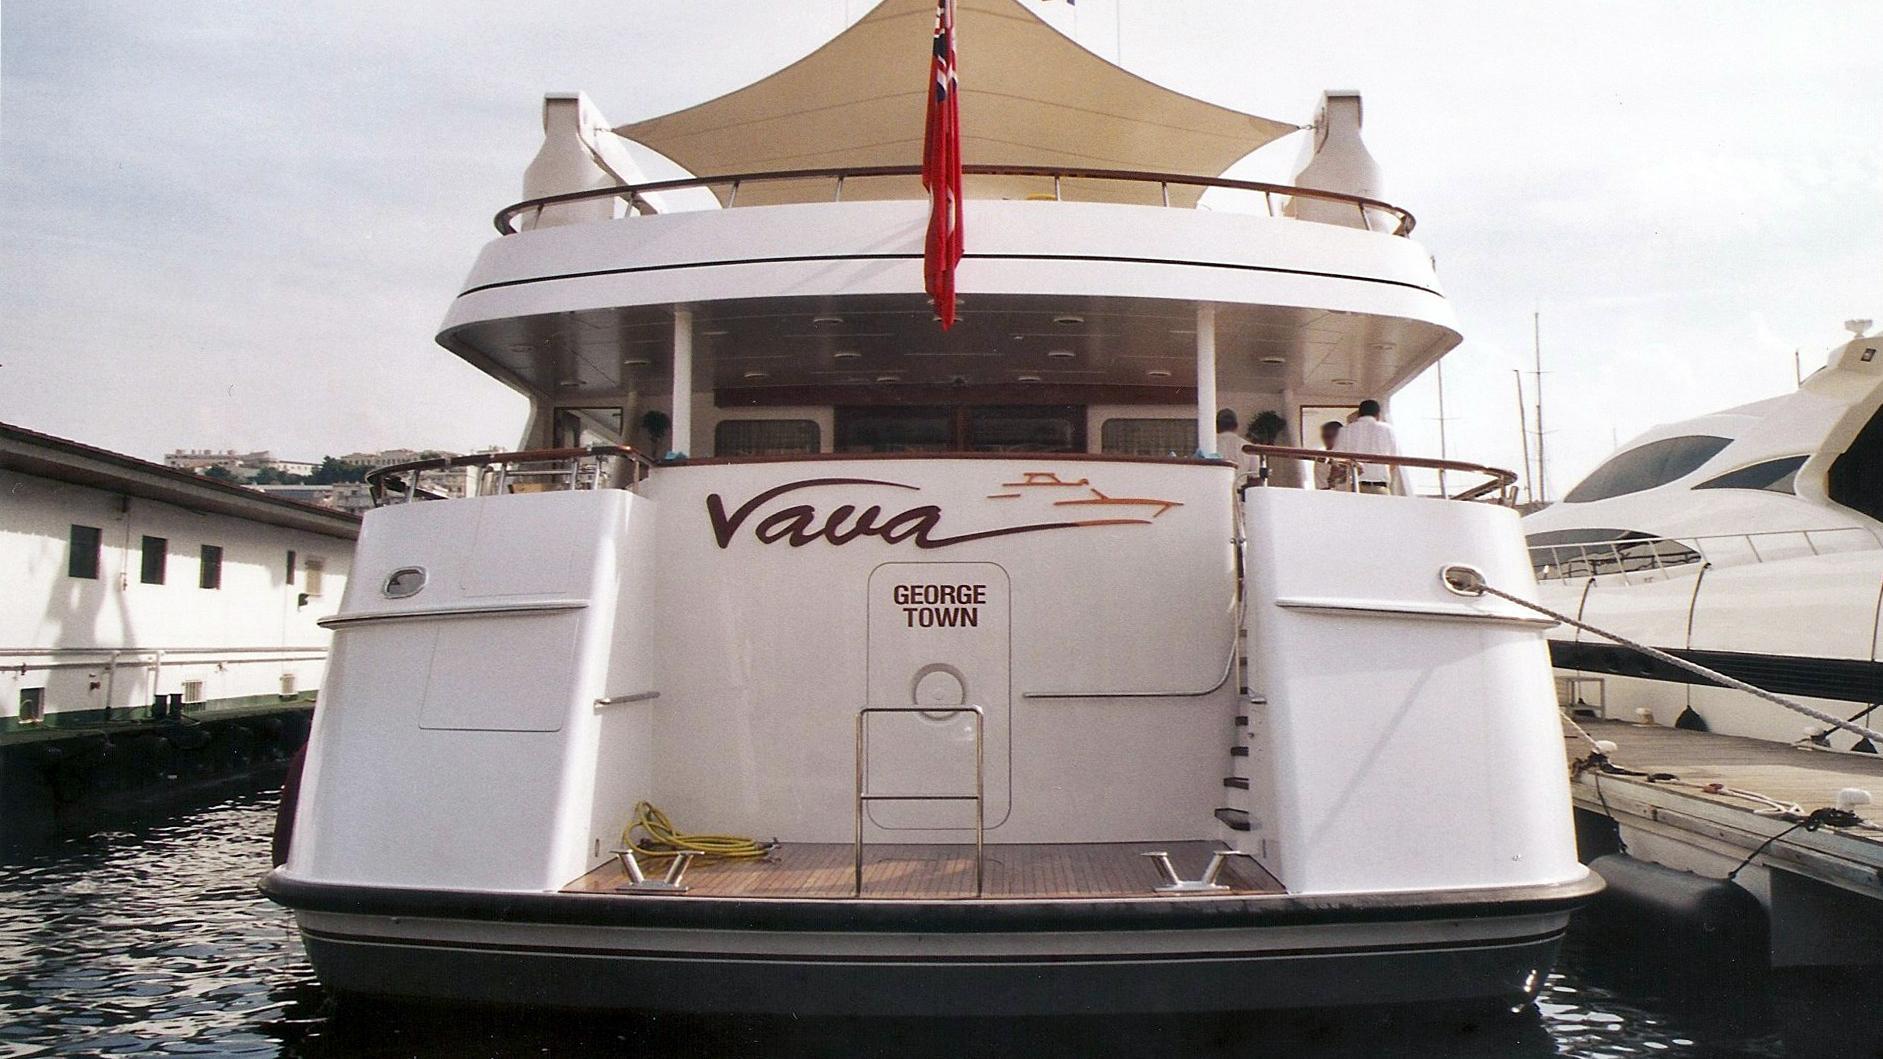 vava-motor-yacht-feadship-1996-47m-stern